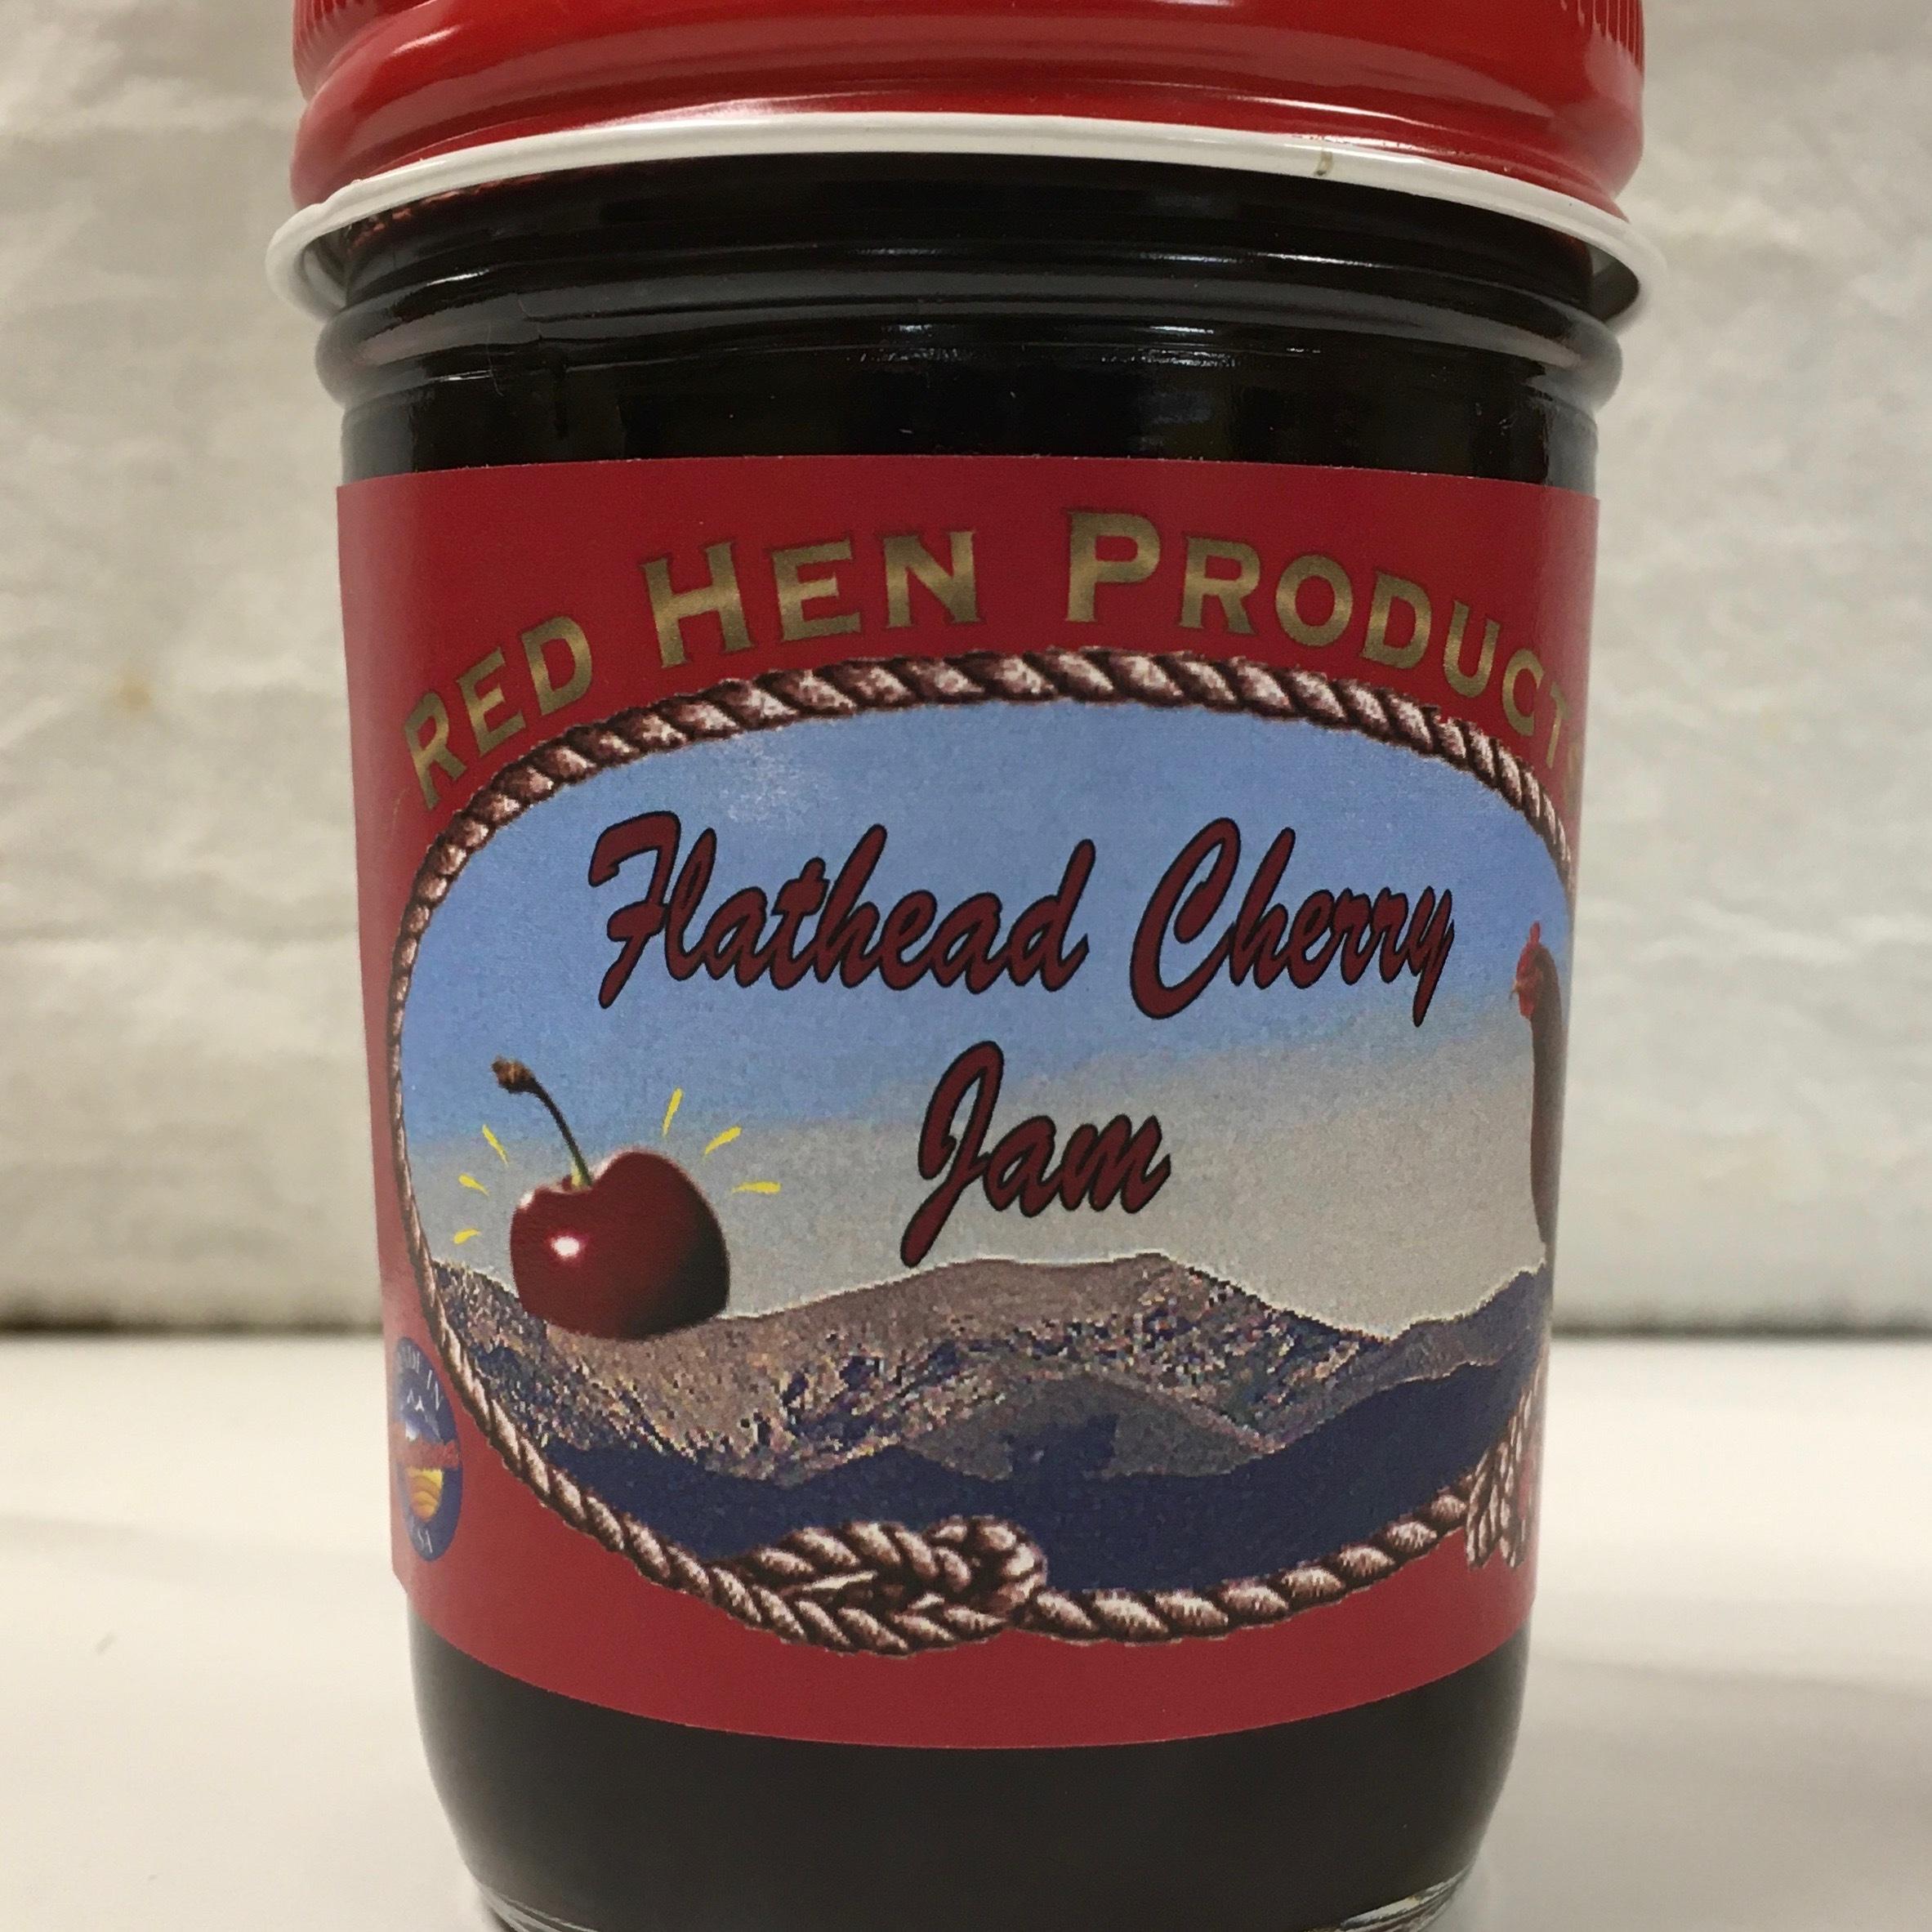 Red Hen Flathead Cherry Jam